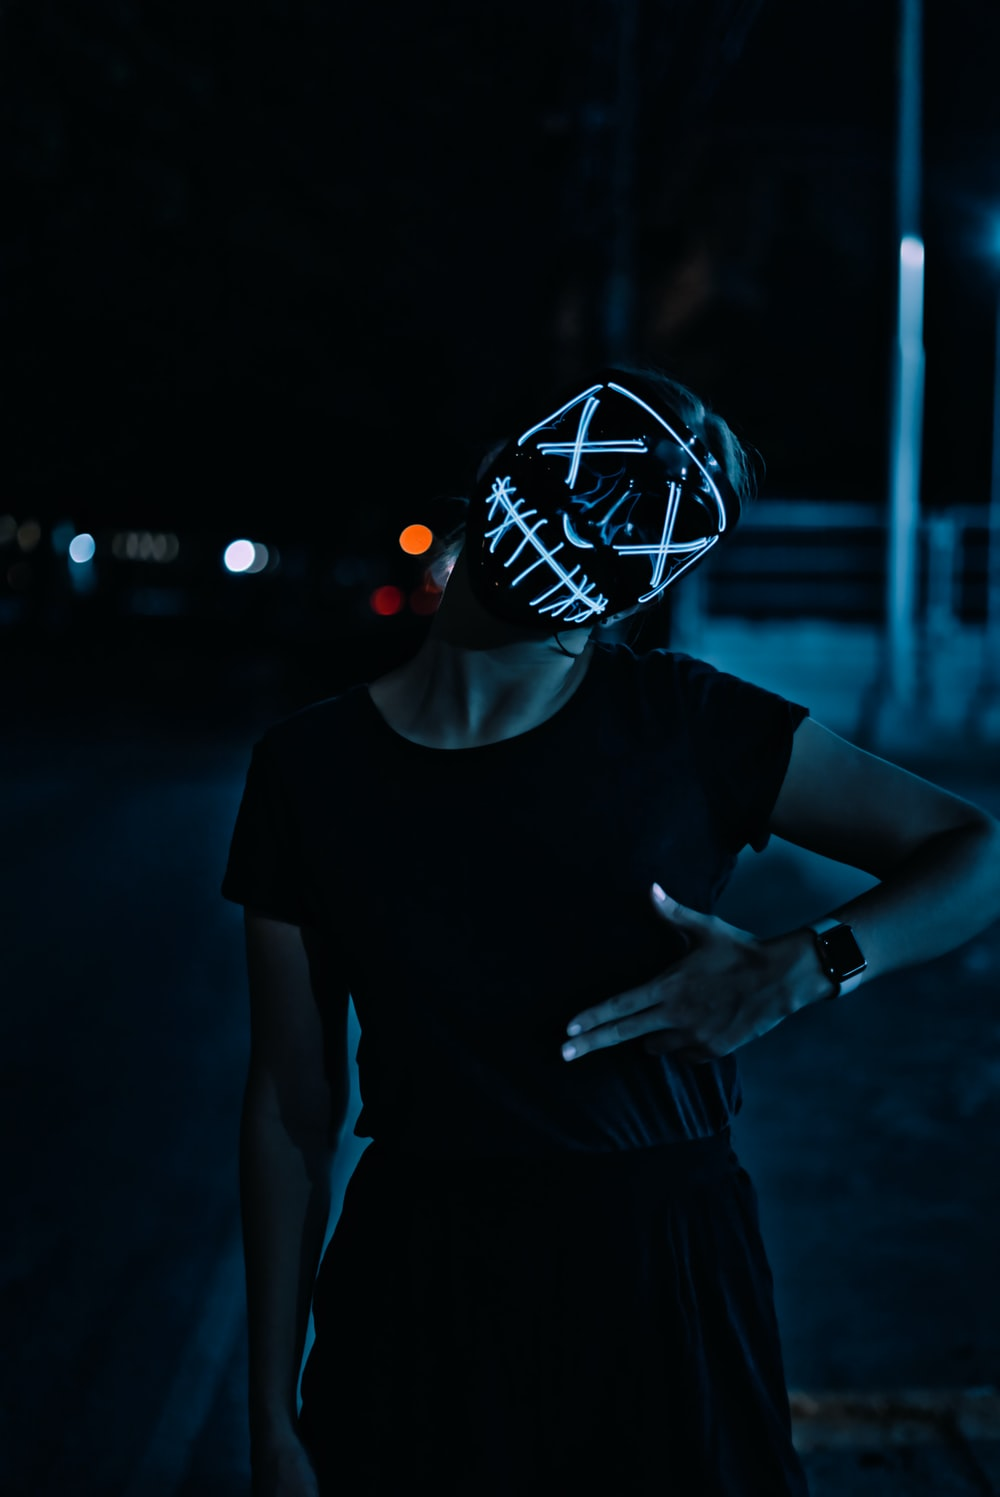 woman wearing black shirt and mask